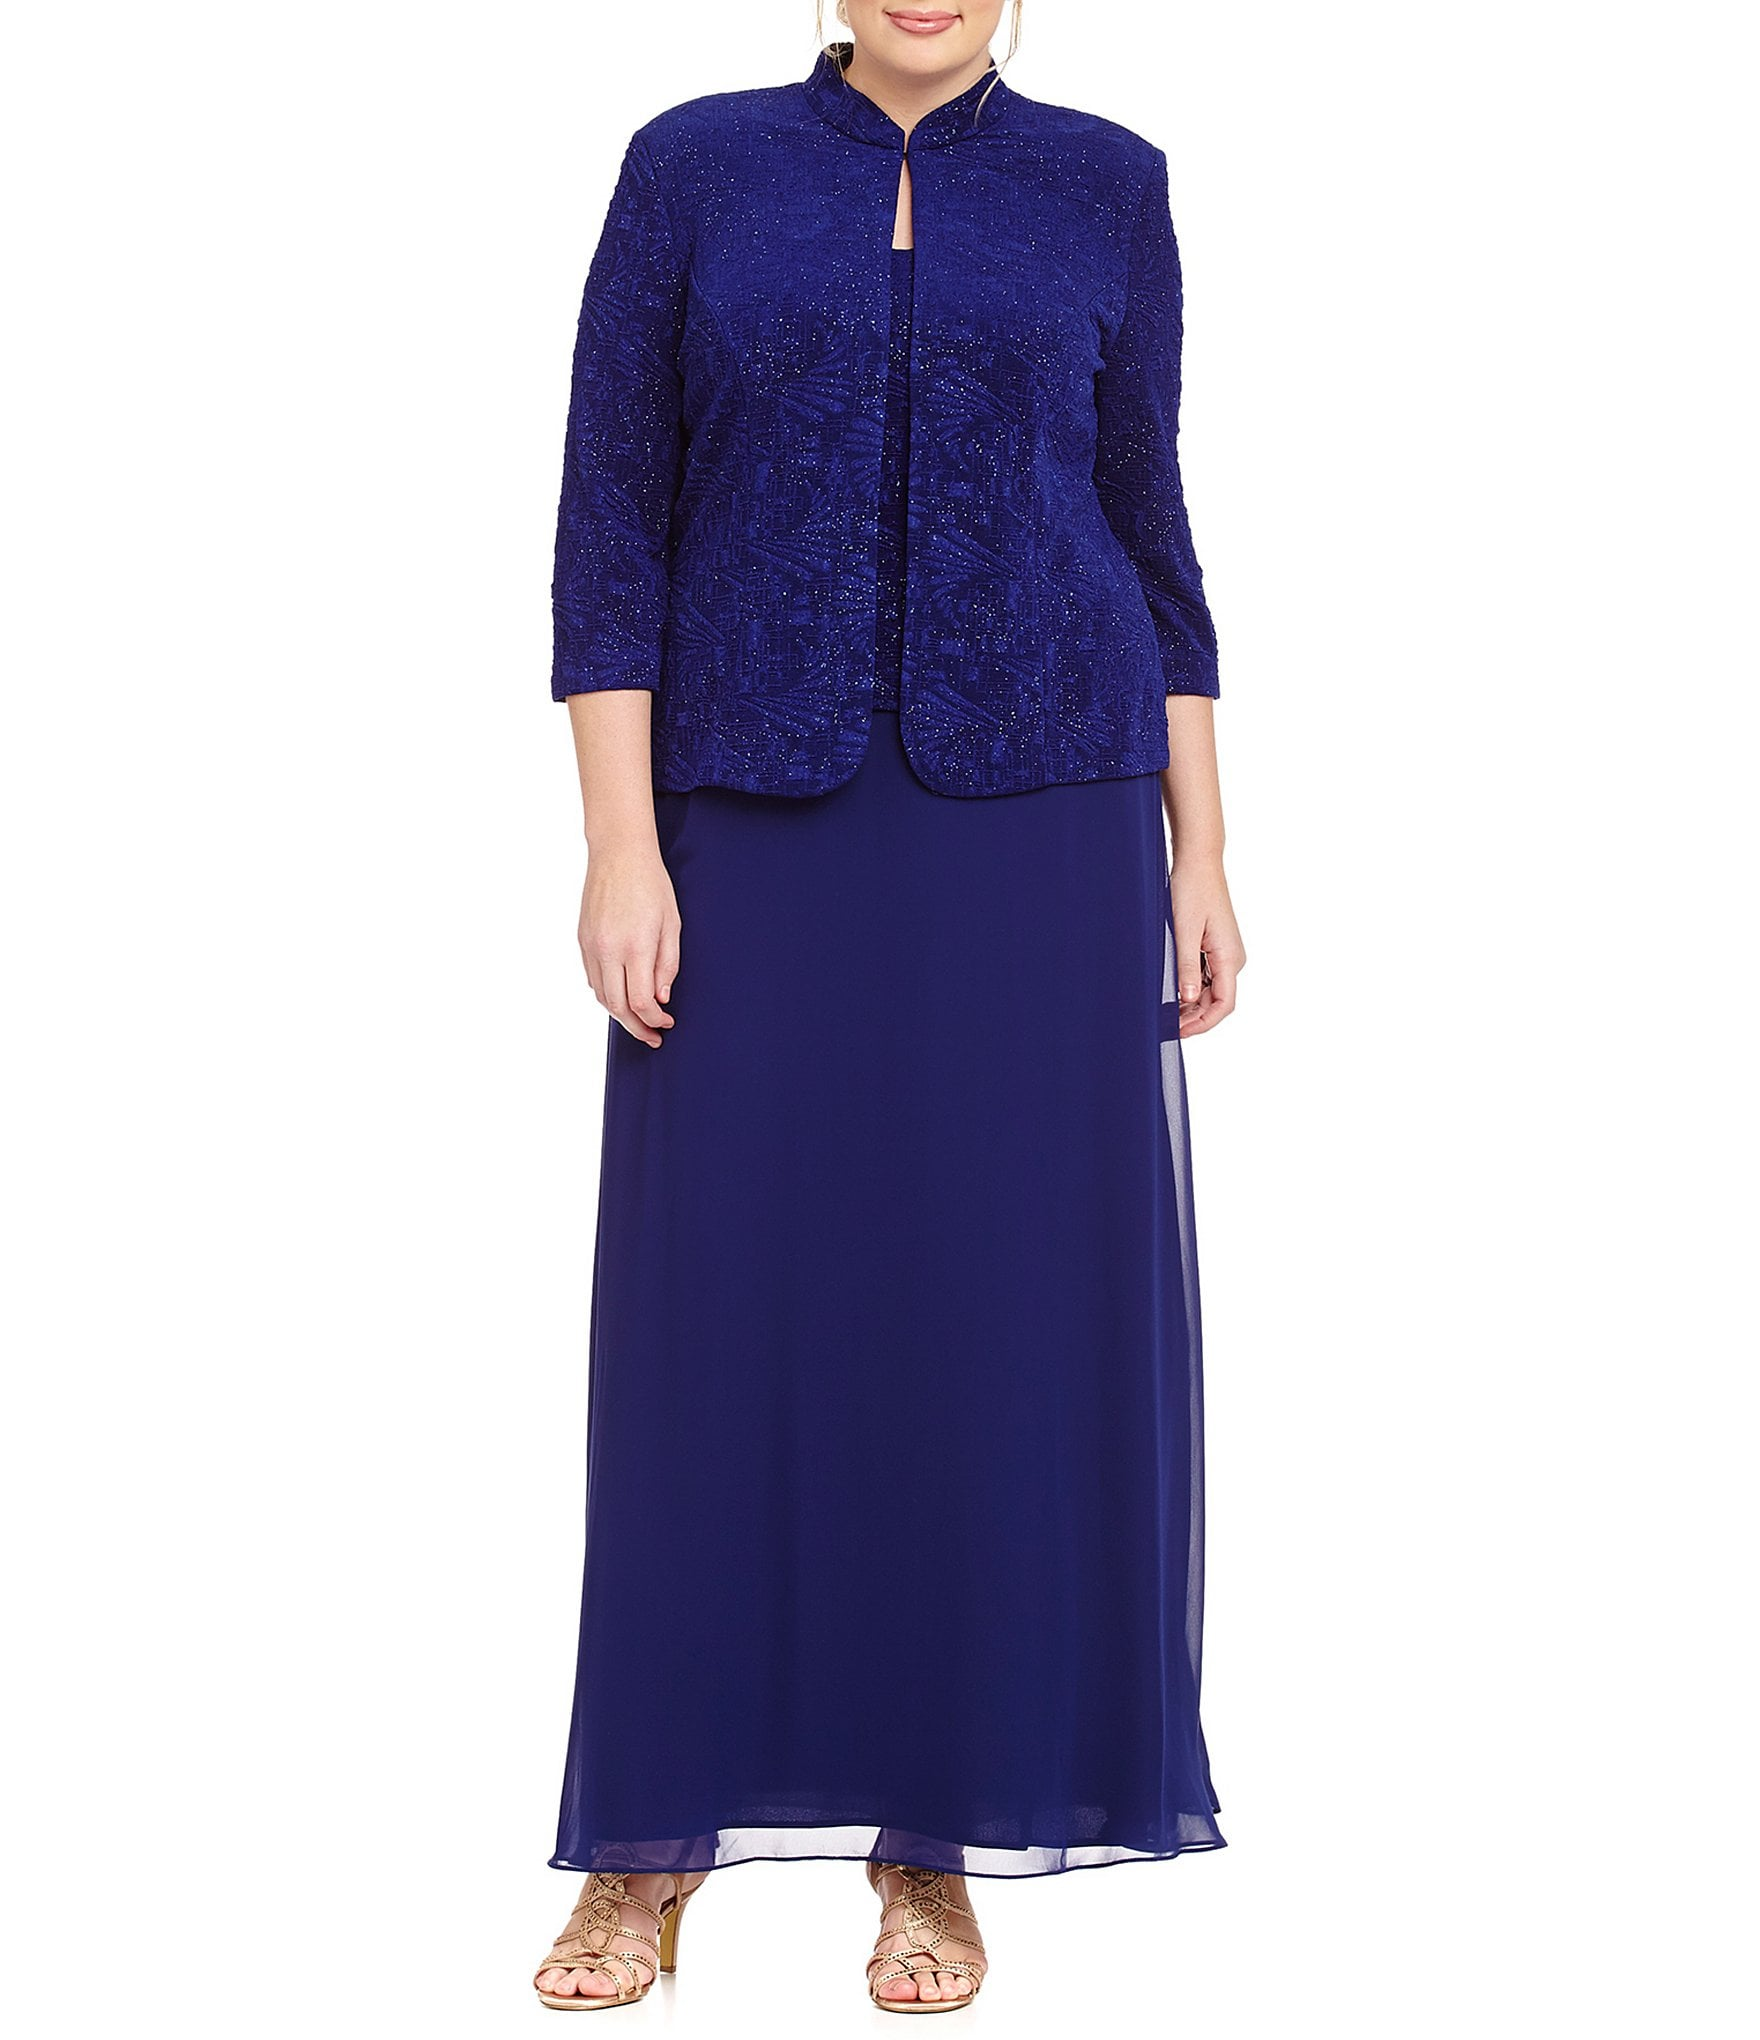 f9b16c4e9a4 Blue Plus-Size Special Occasion Jacket Dresses